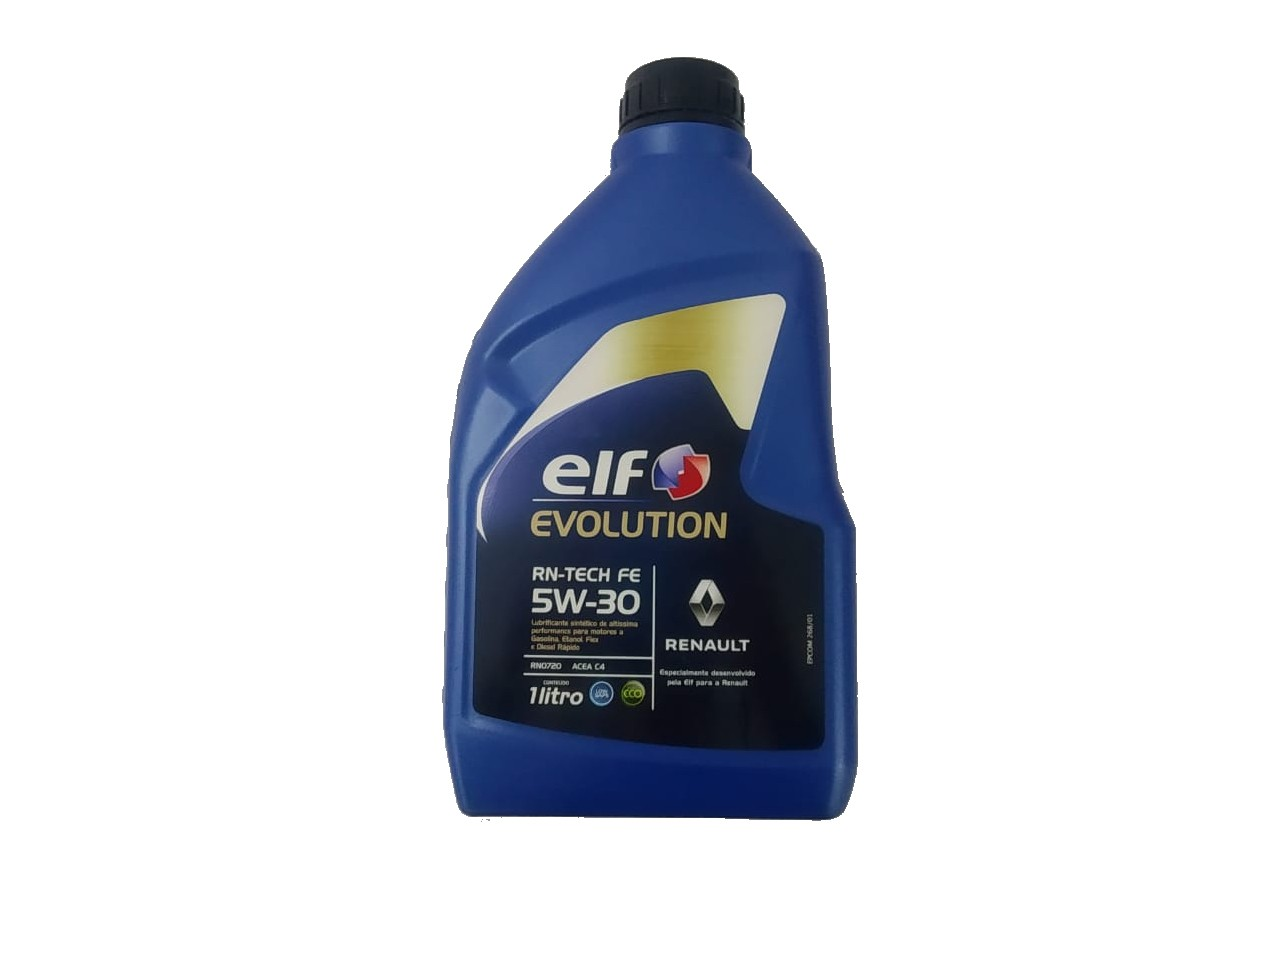 OLEO 5W30 ELF EVOLUTION RN-TECH FE P/ RENAULT MASTER 2.3